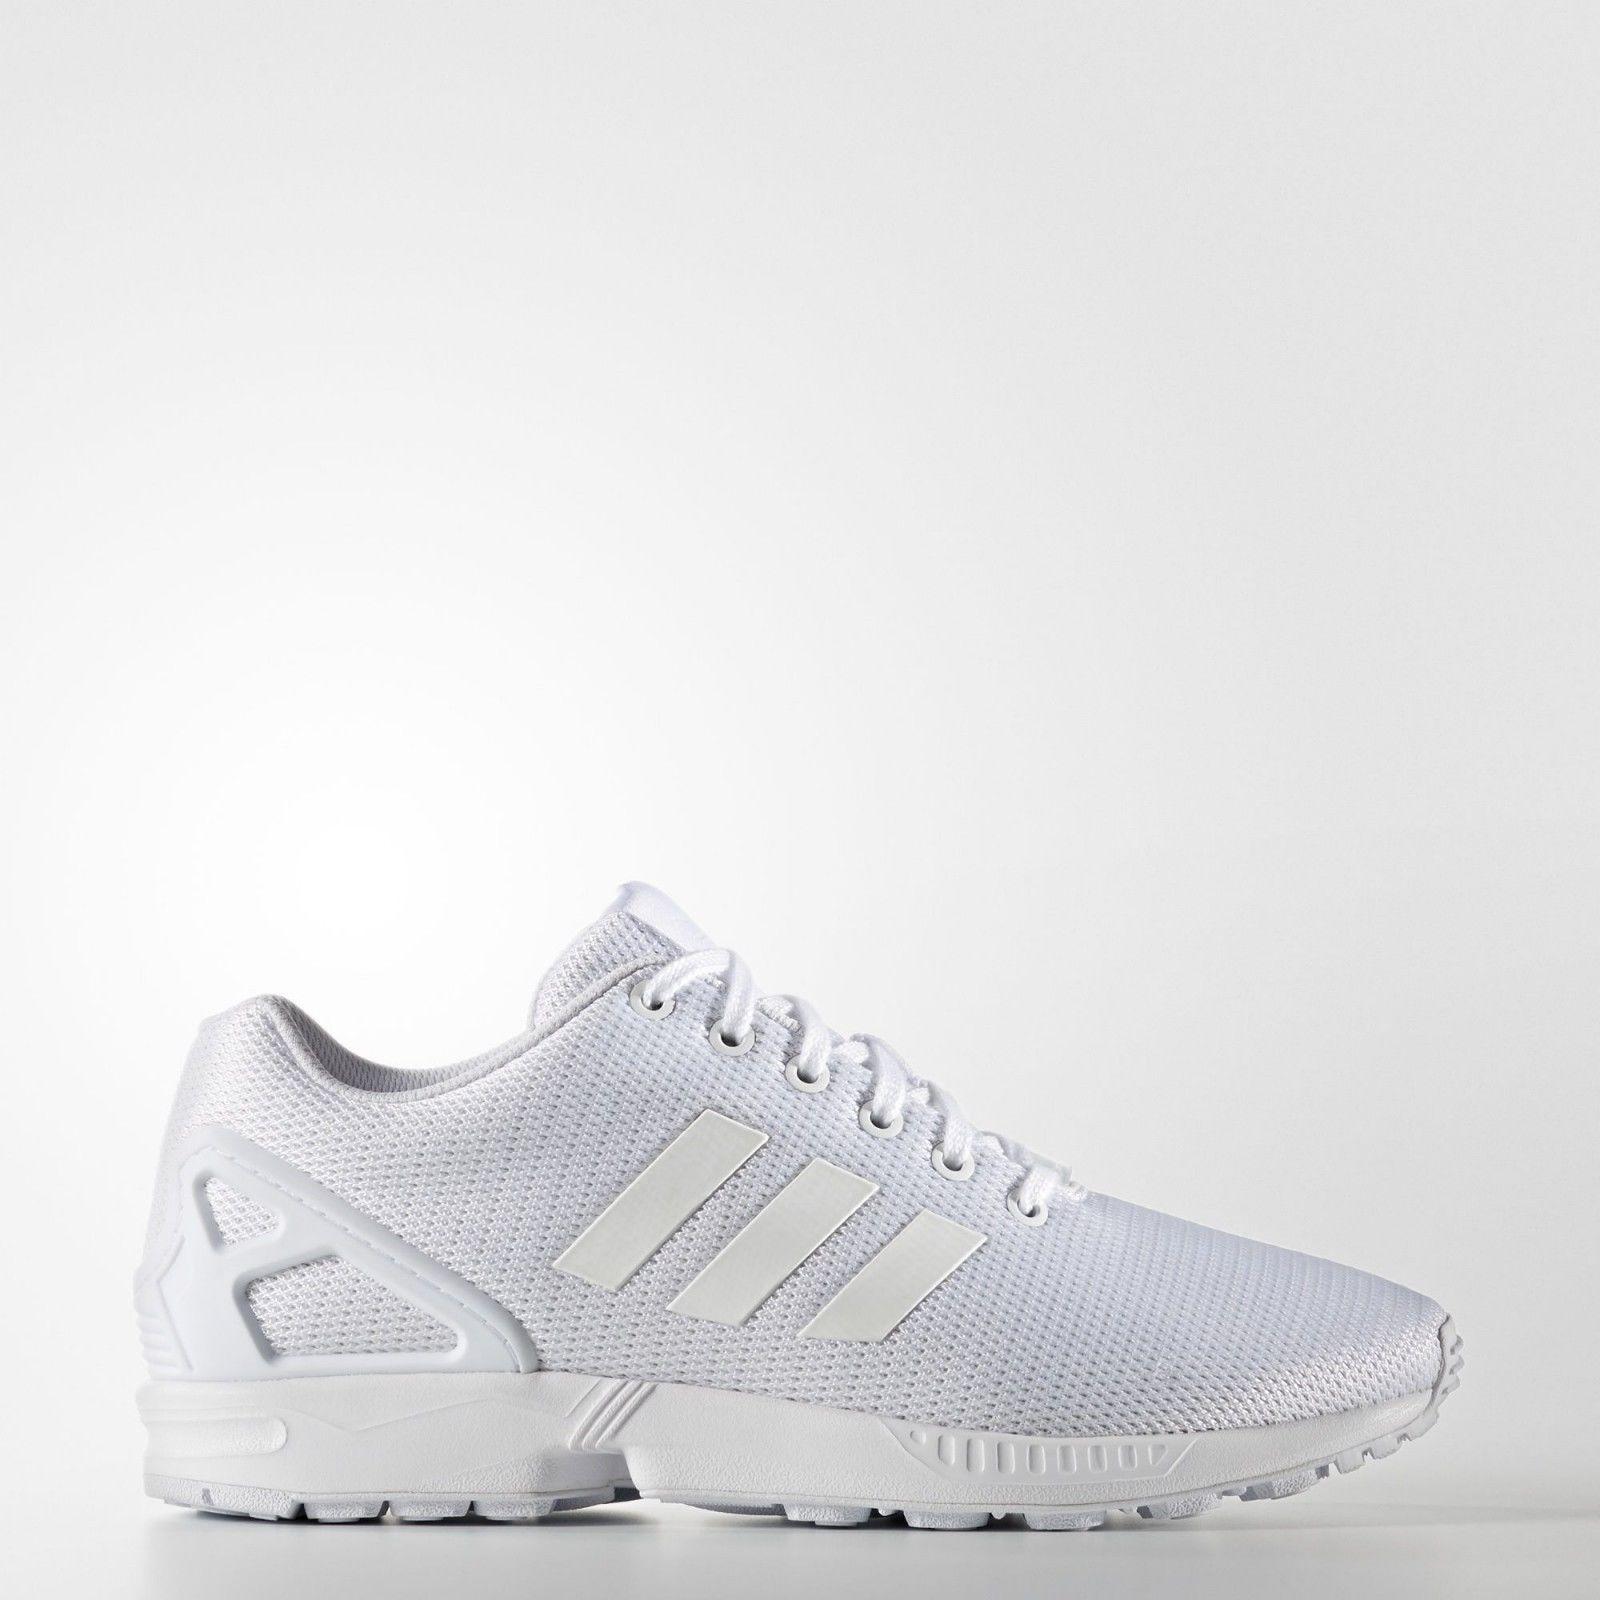 Uomo Zx Adidas Scarpe S32277 S32279 P Sneakers Originale Shoes Flux aww5FqBI fd450a1235a